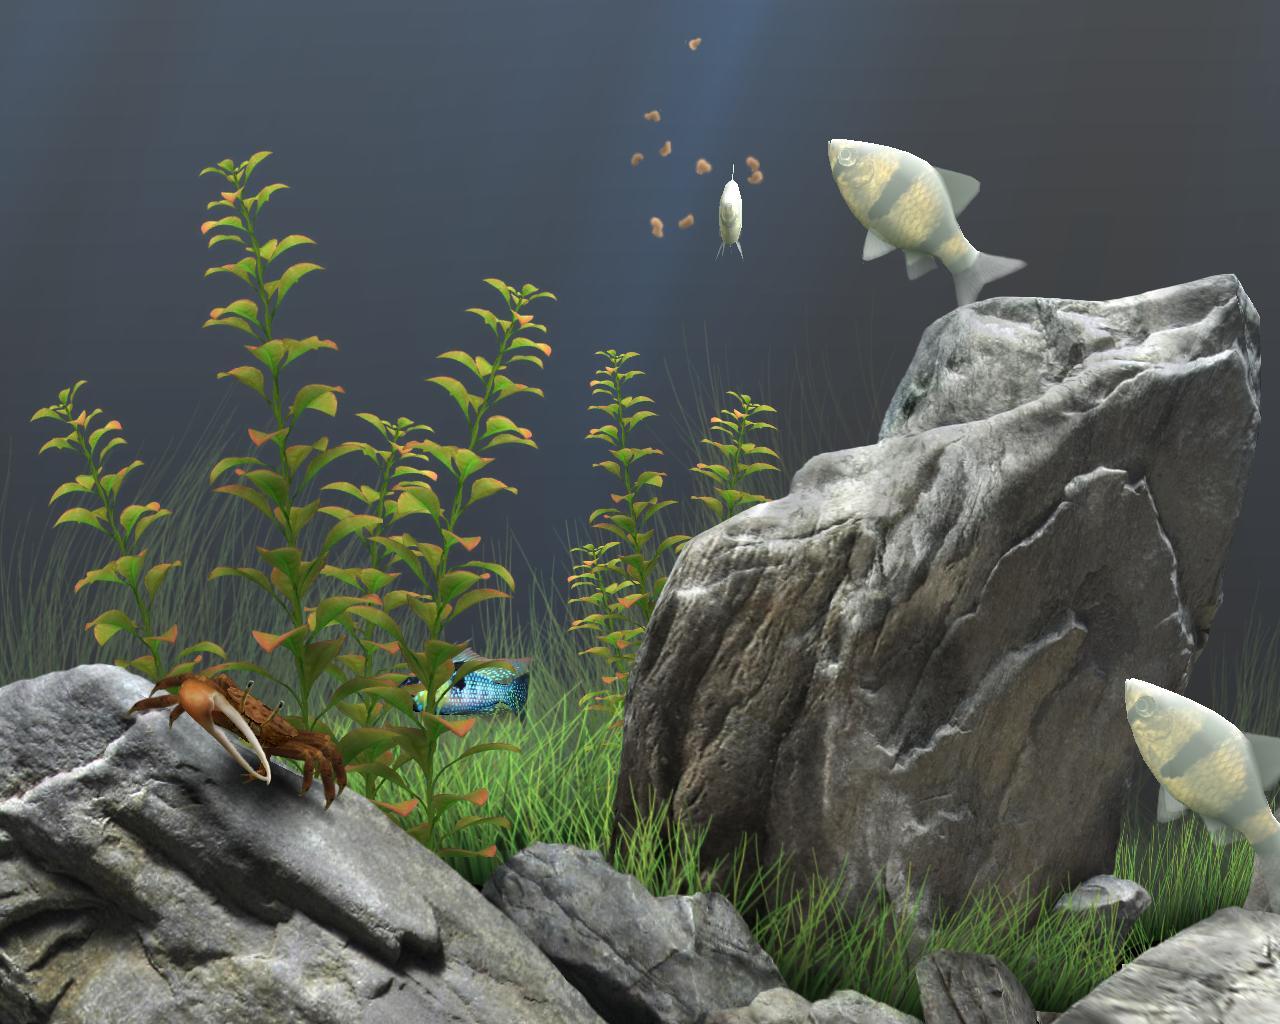 Dream aquarium screensaver very realistic screensavers